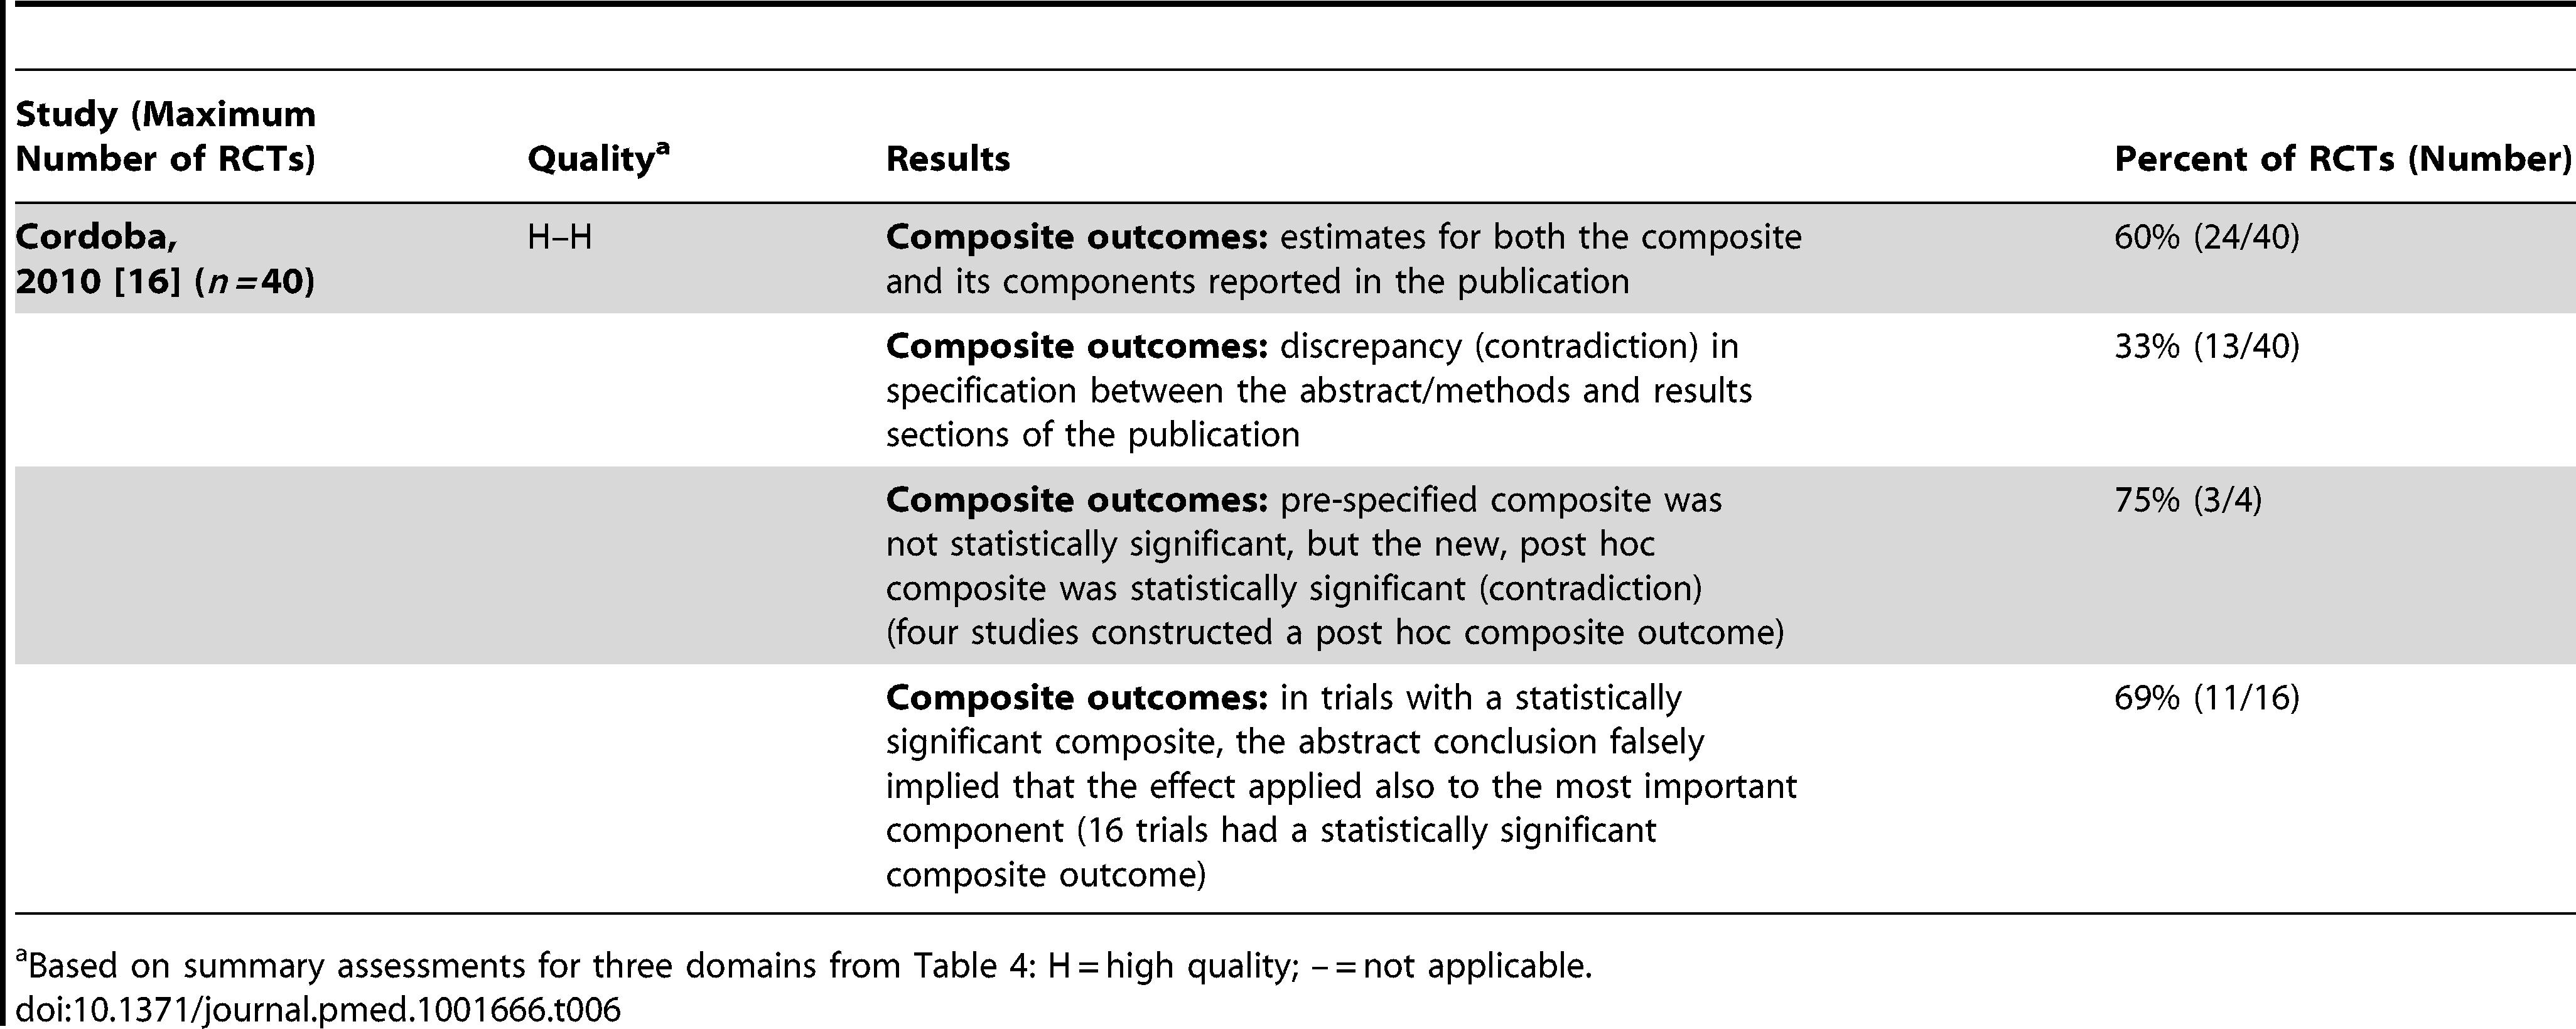 Composite outcomes.